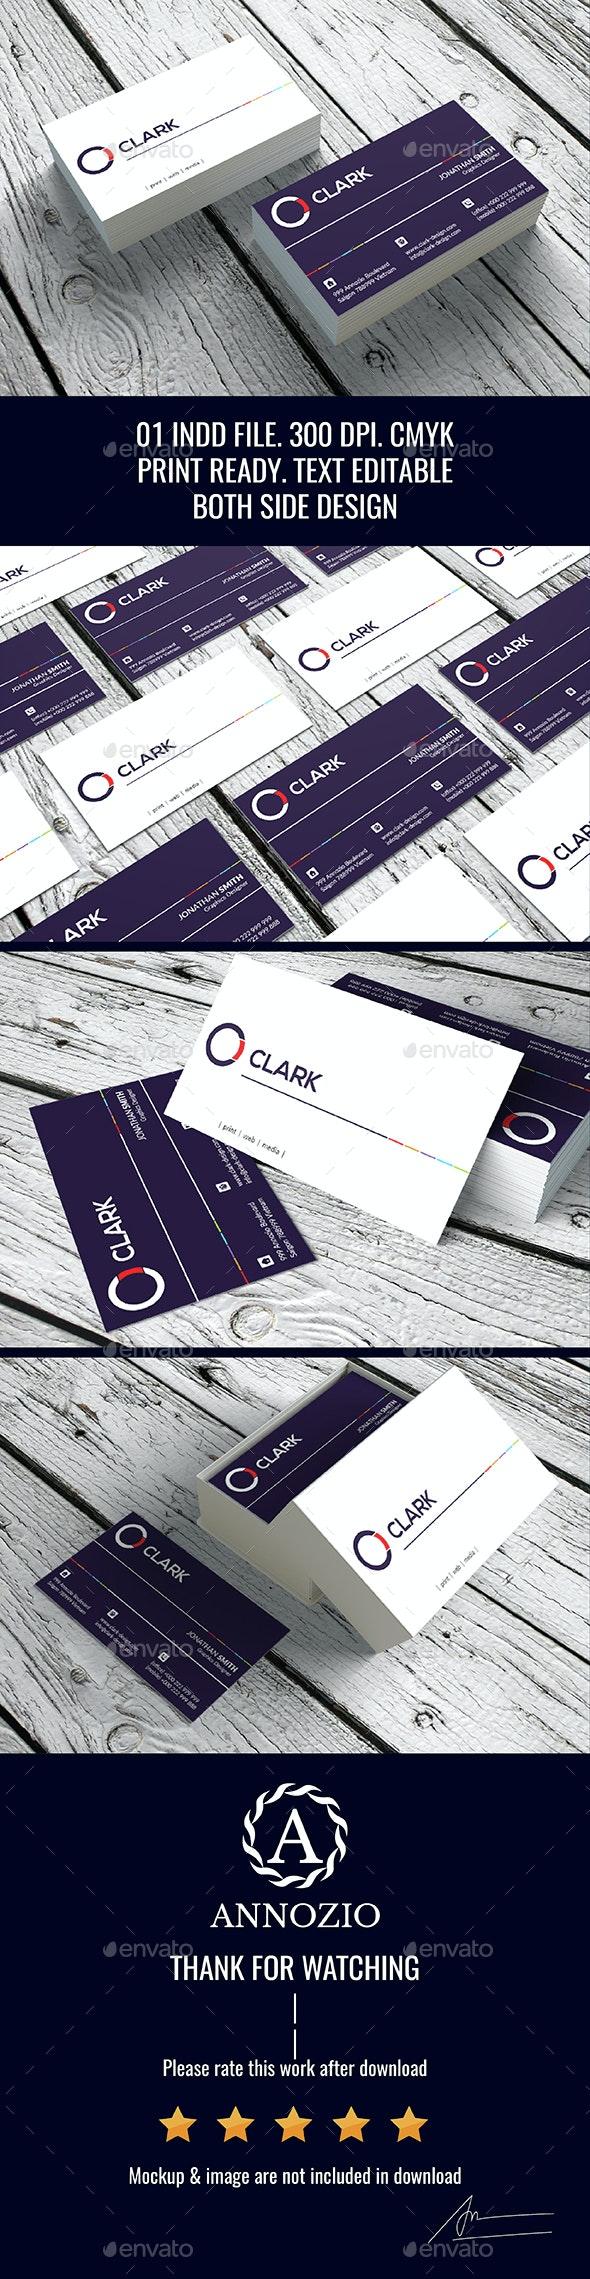 Minimal Creative BC InDesign 0012 - Creative Business Cards